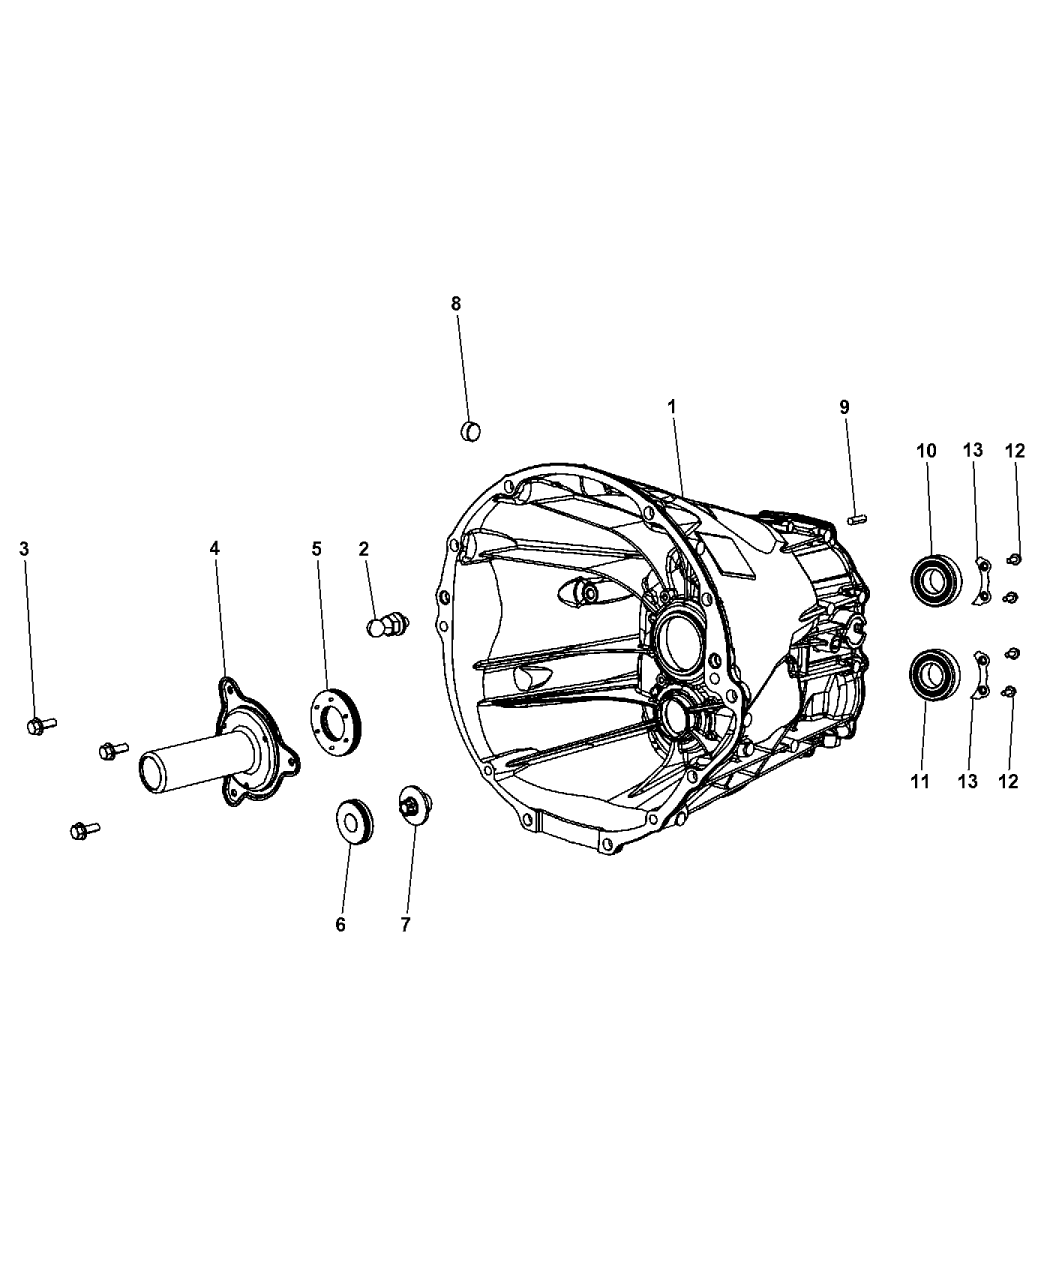 2014 Jeep Wrangler Case & Related Parts - Mopar Parts Giant